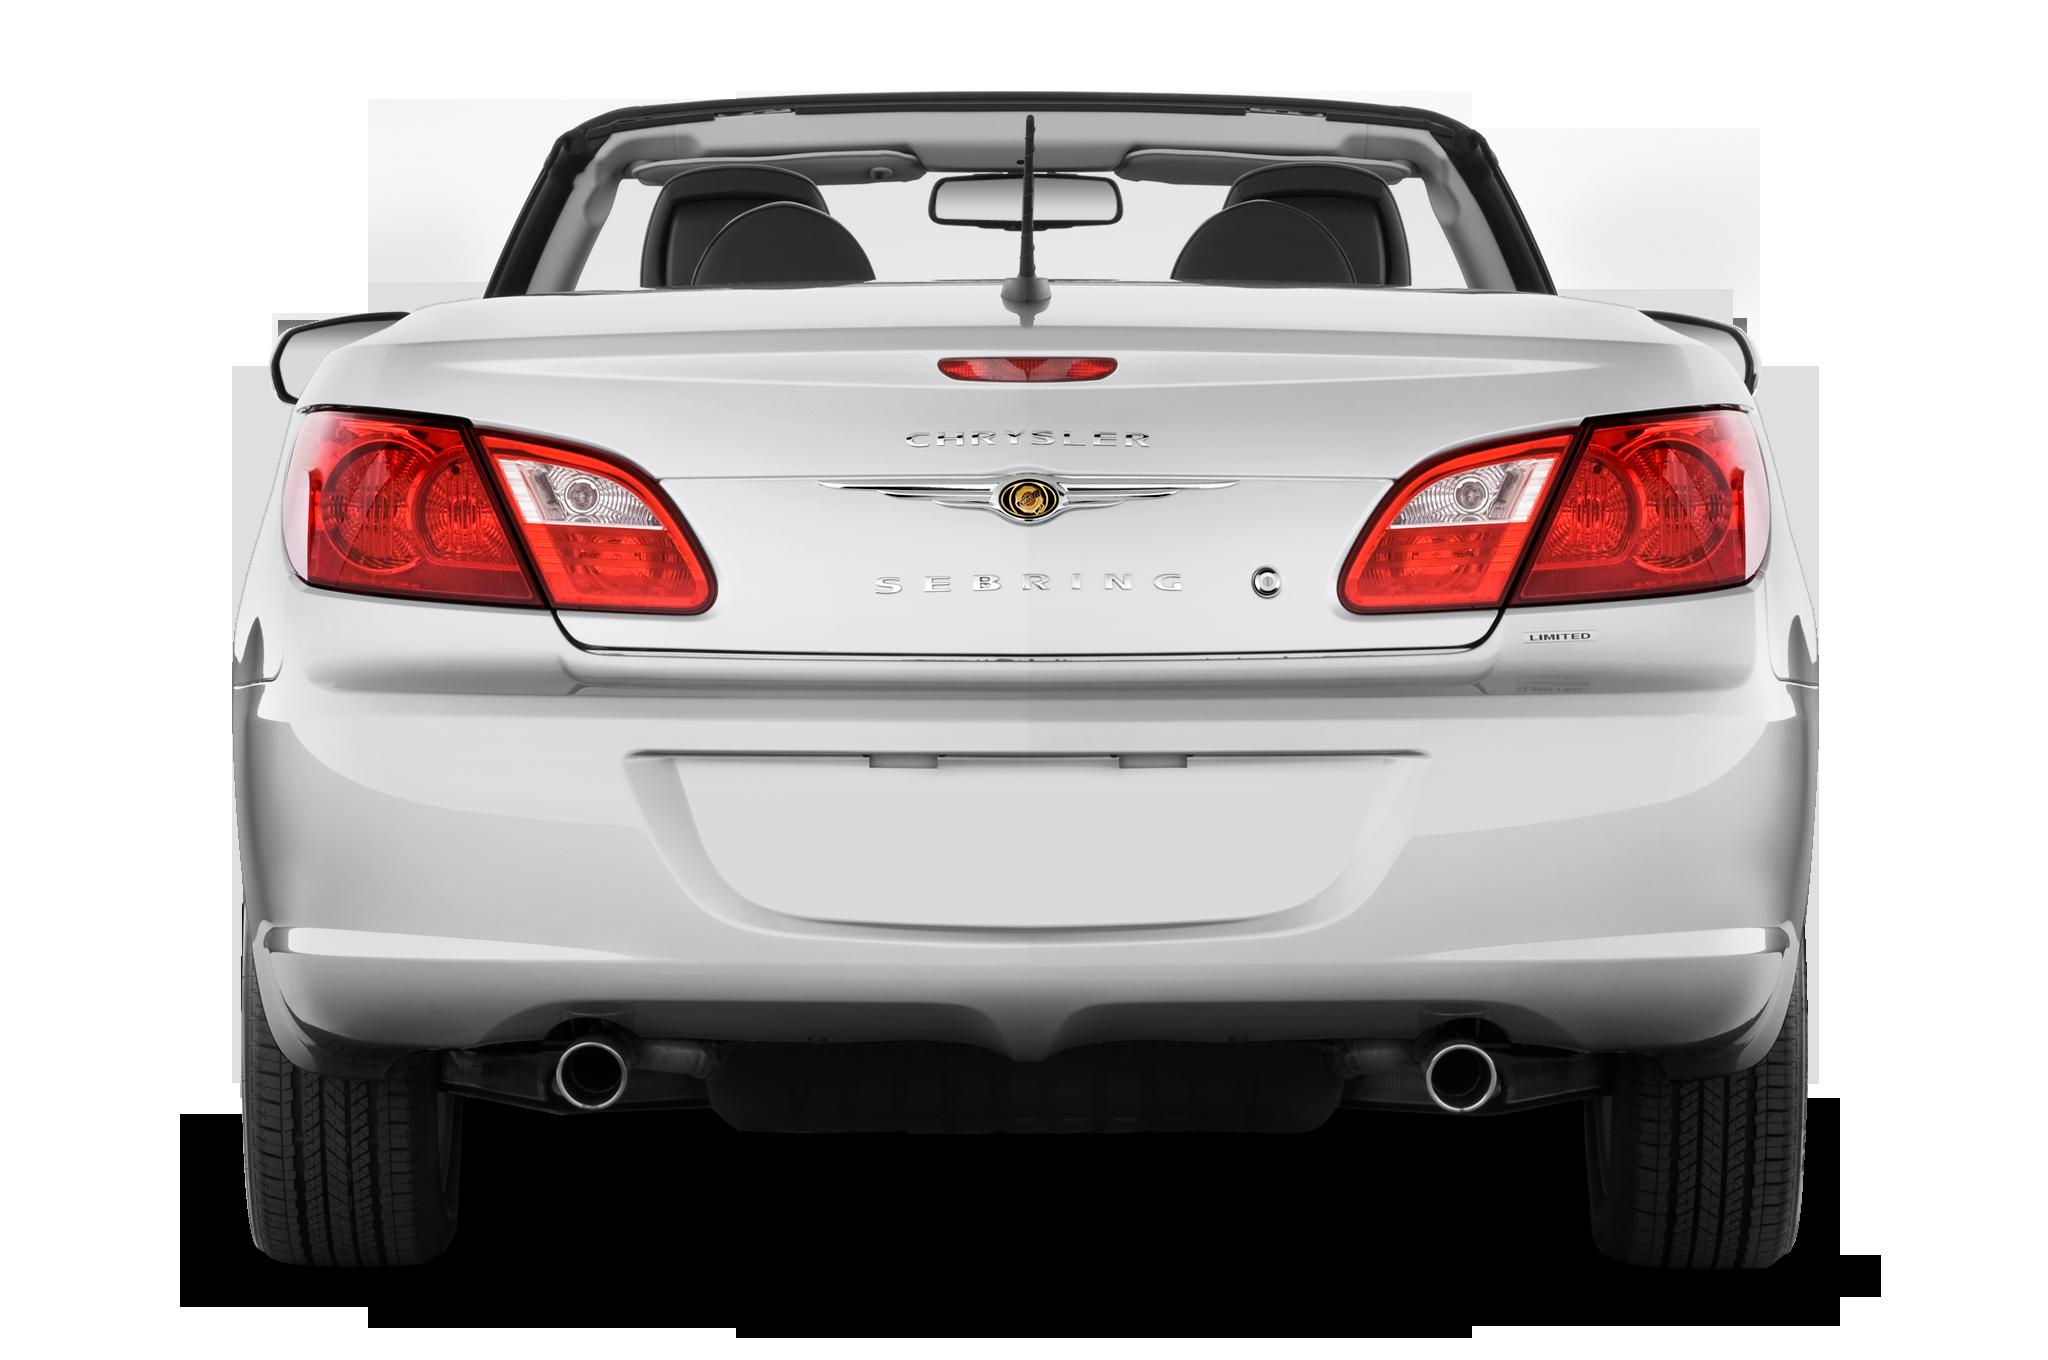 Chrysler Sebring Limited Convertible Rear View on 2007 Chrysler Sebring Repair Manual Free